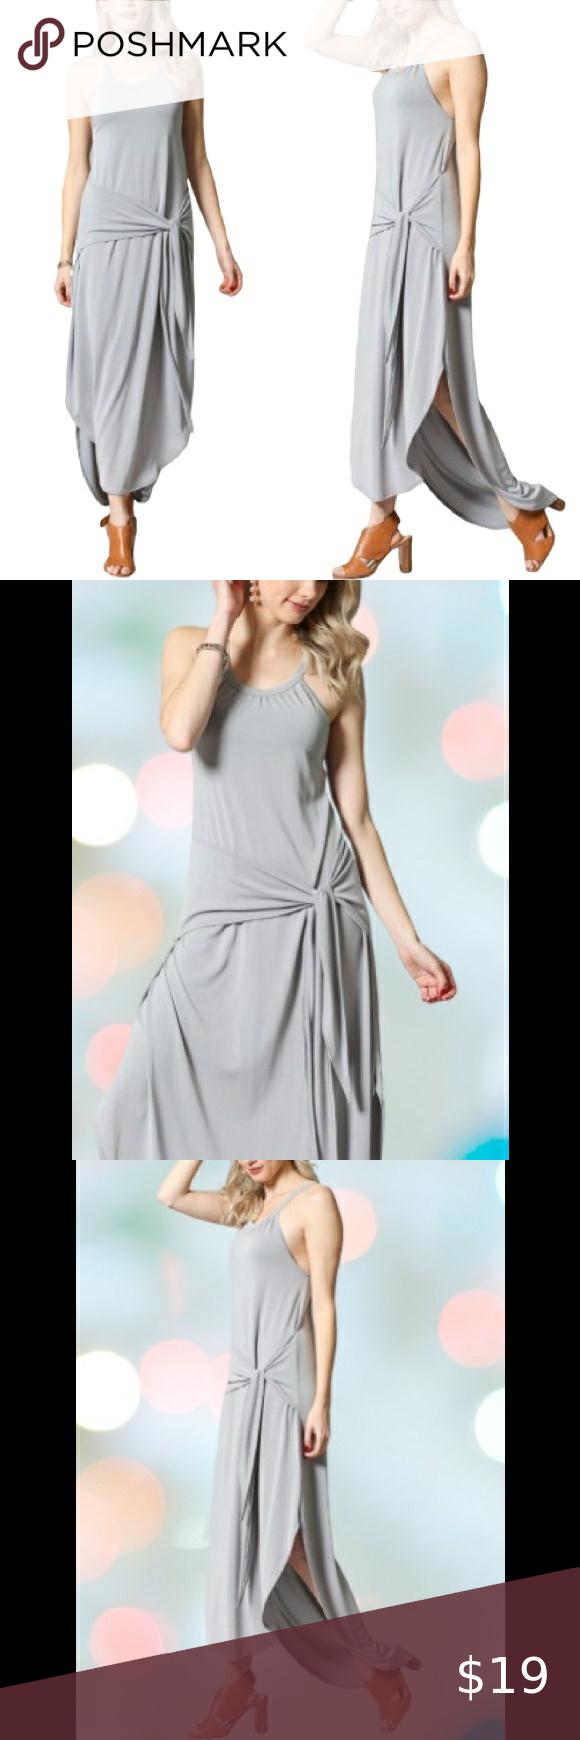 Sleeveless Halter Maxi Dress Light Silver Cupro Sleeveless Maxi Dress With Round Hem Waist Tie Model Is 5 8 Wearing A In 2020 Boutique Maxi Dresses Maxi Dress Dresses